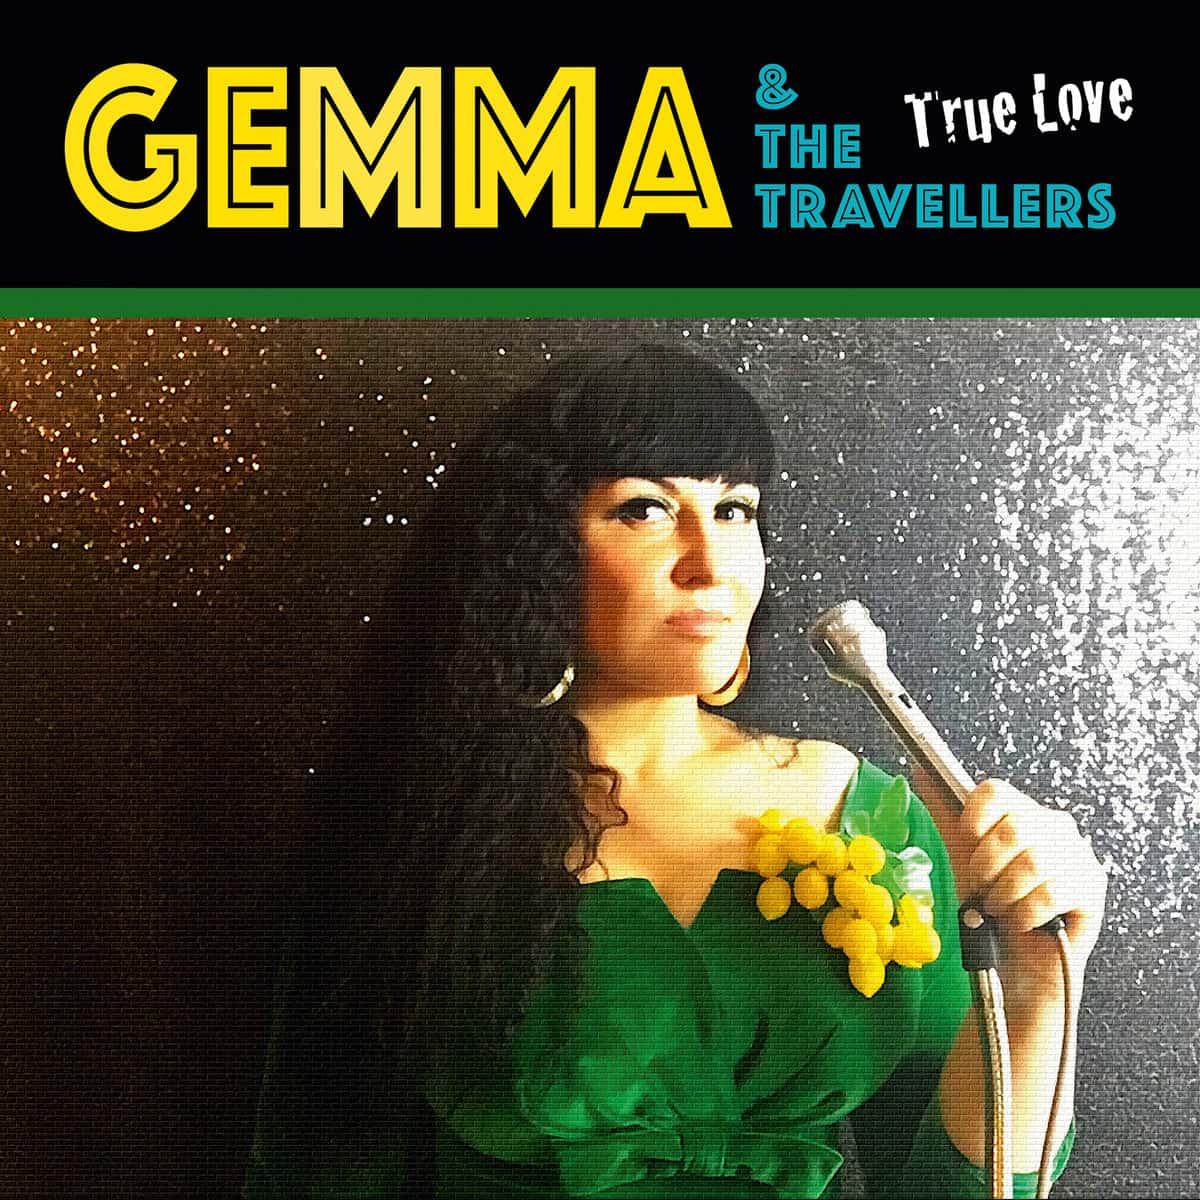 GEMMA & THE TRAVELLERS - TRUE LOVE • Video + full Album-Stream